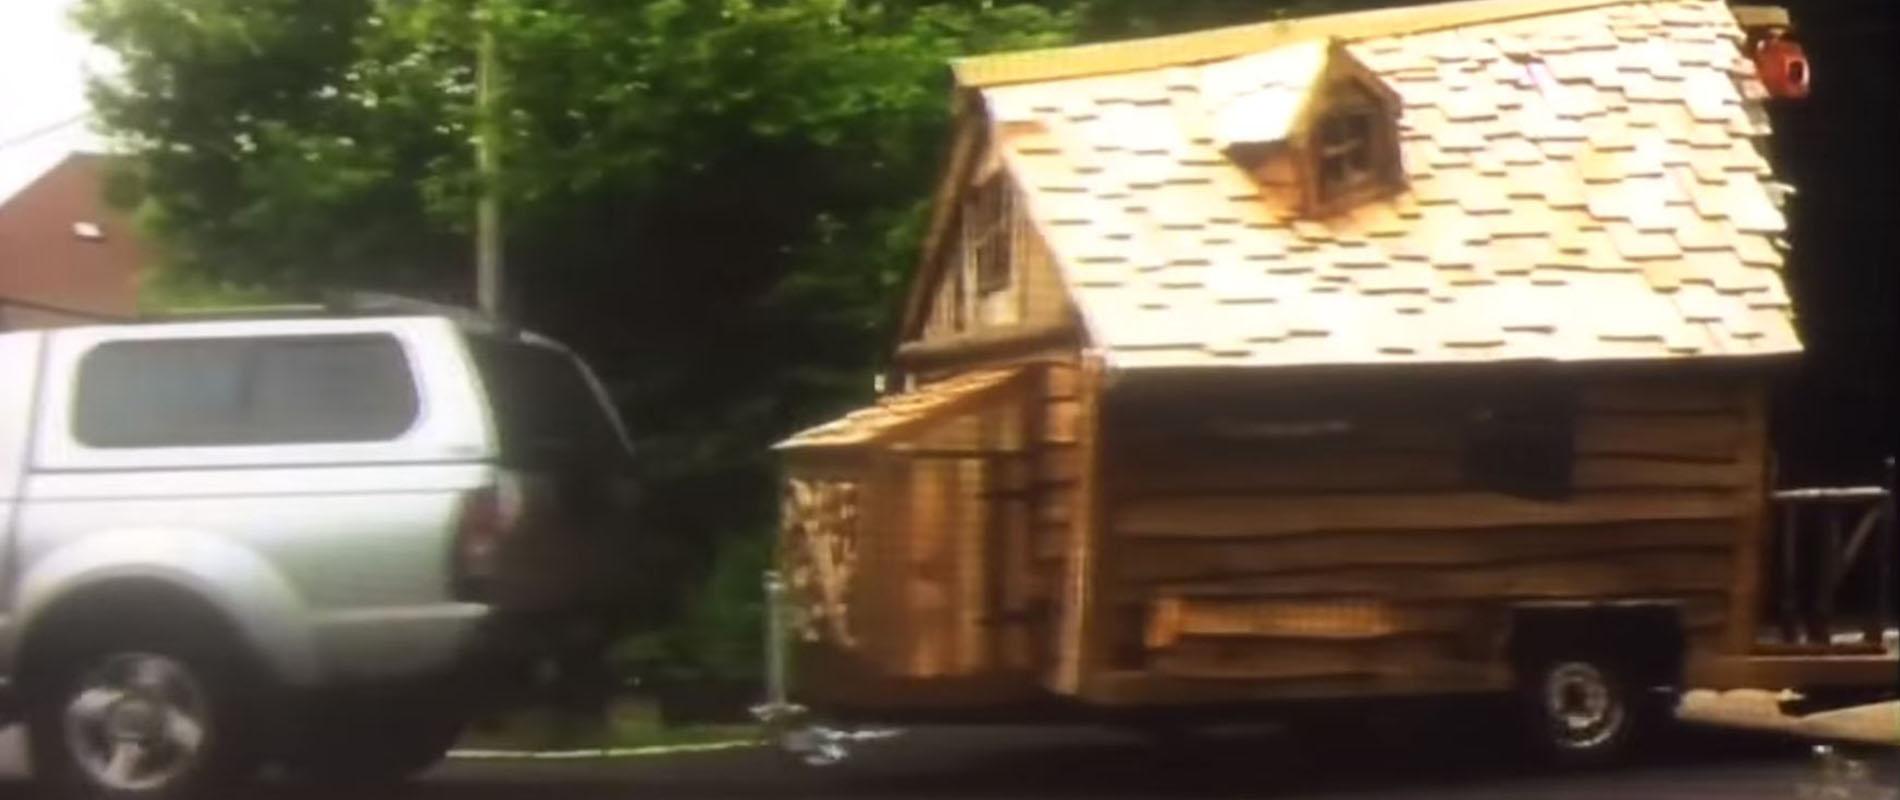 Pixie Cabin Using Western Red Cedar Shingles